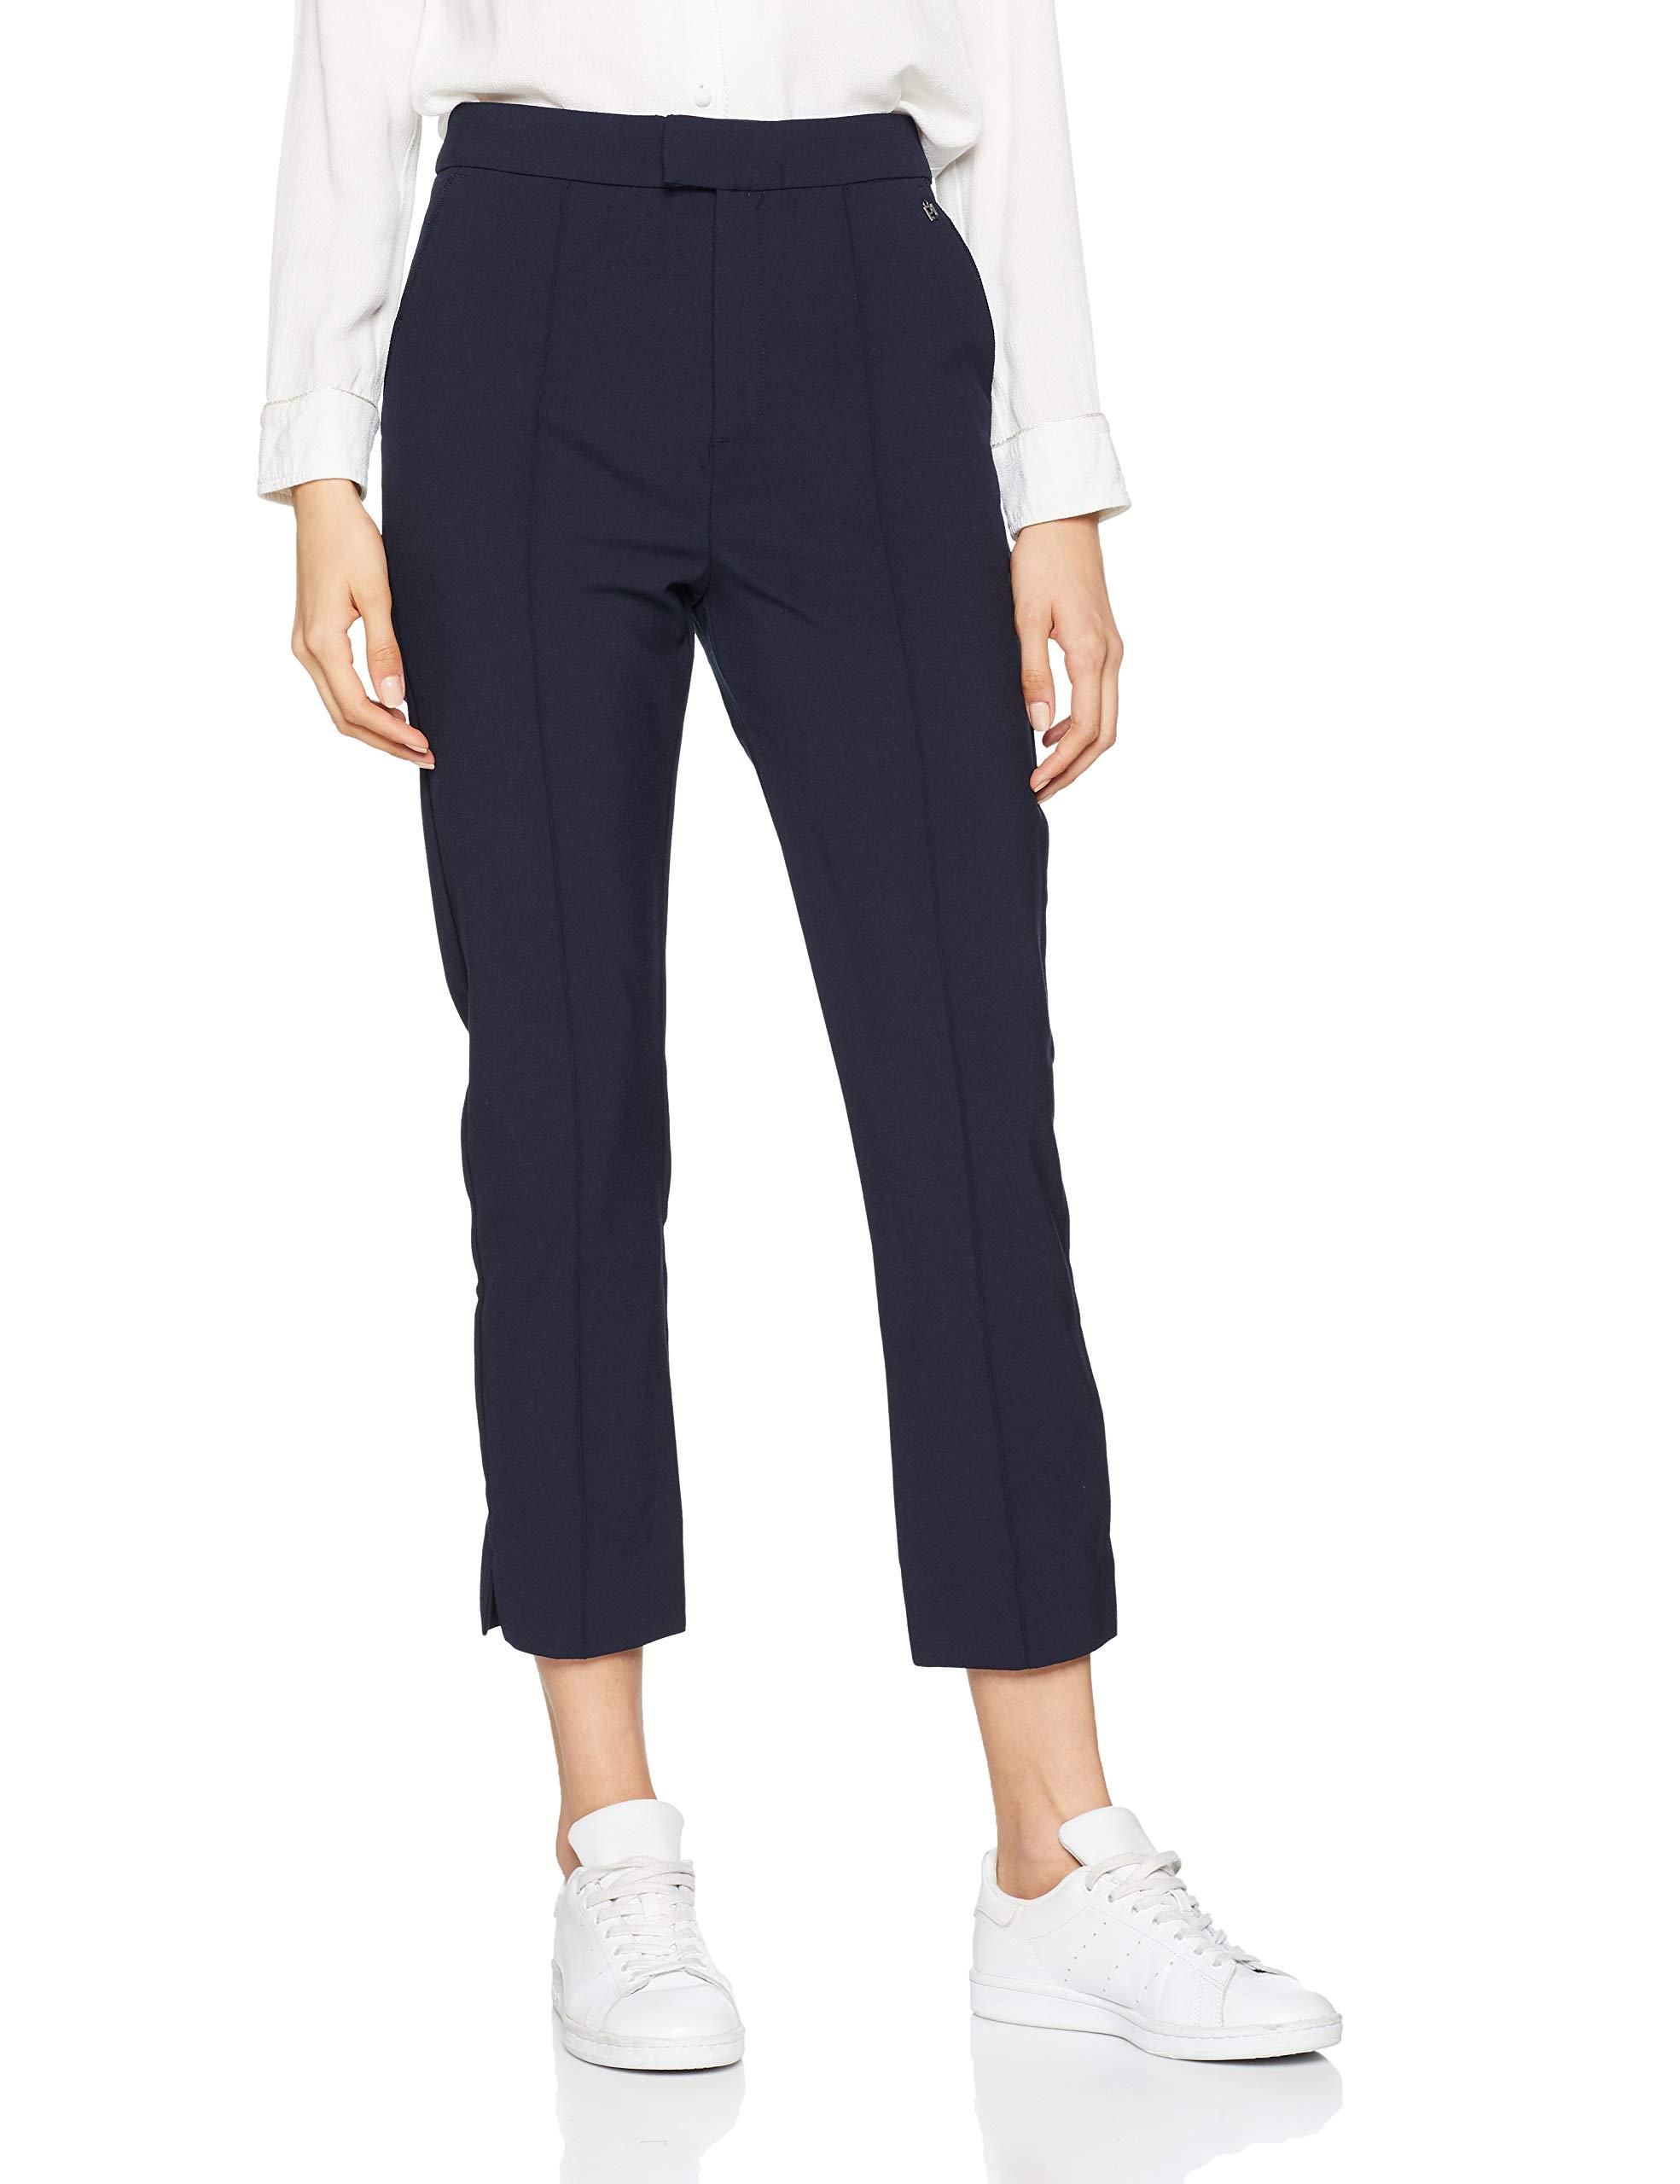 Zoe Fabricant38Femme Sea 597W28taille Jeans Pepe PantalonBleudeep 0vw8mNn